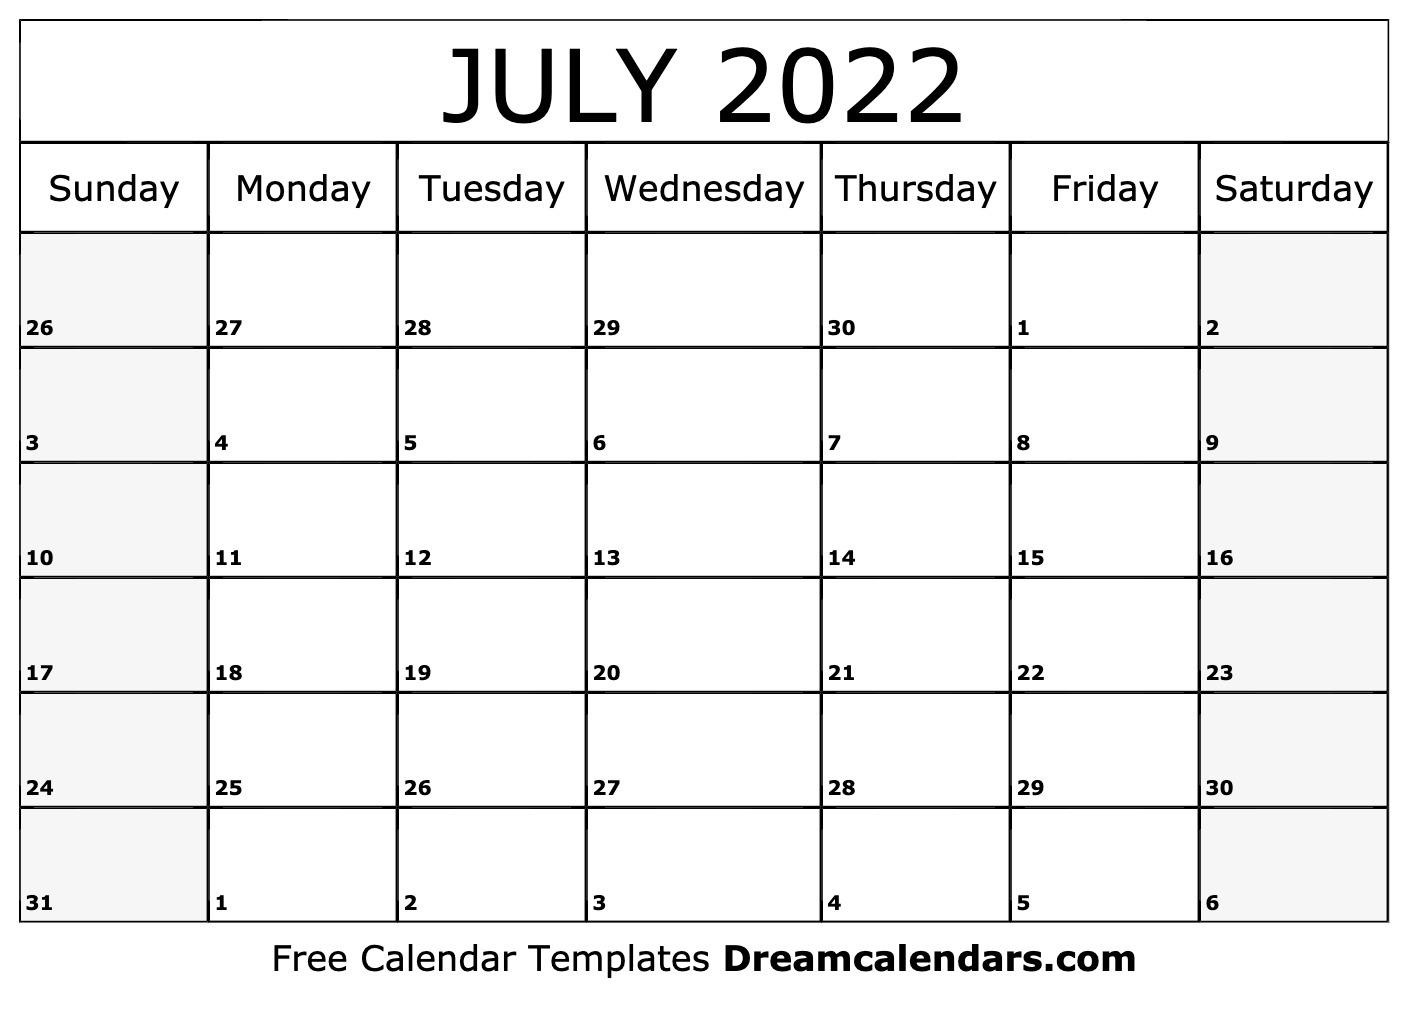 Printable June 2022 Calendar Free.July 2022 Calendar Free Blank Printable Templates